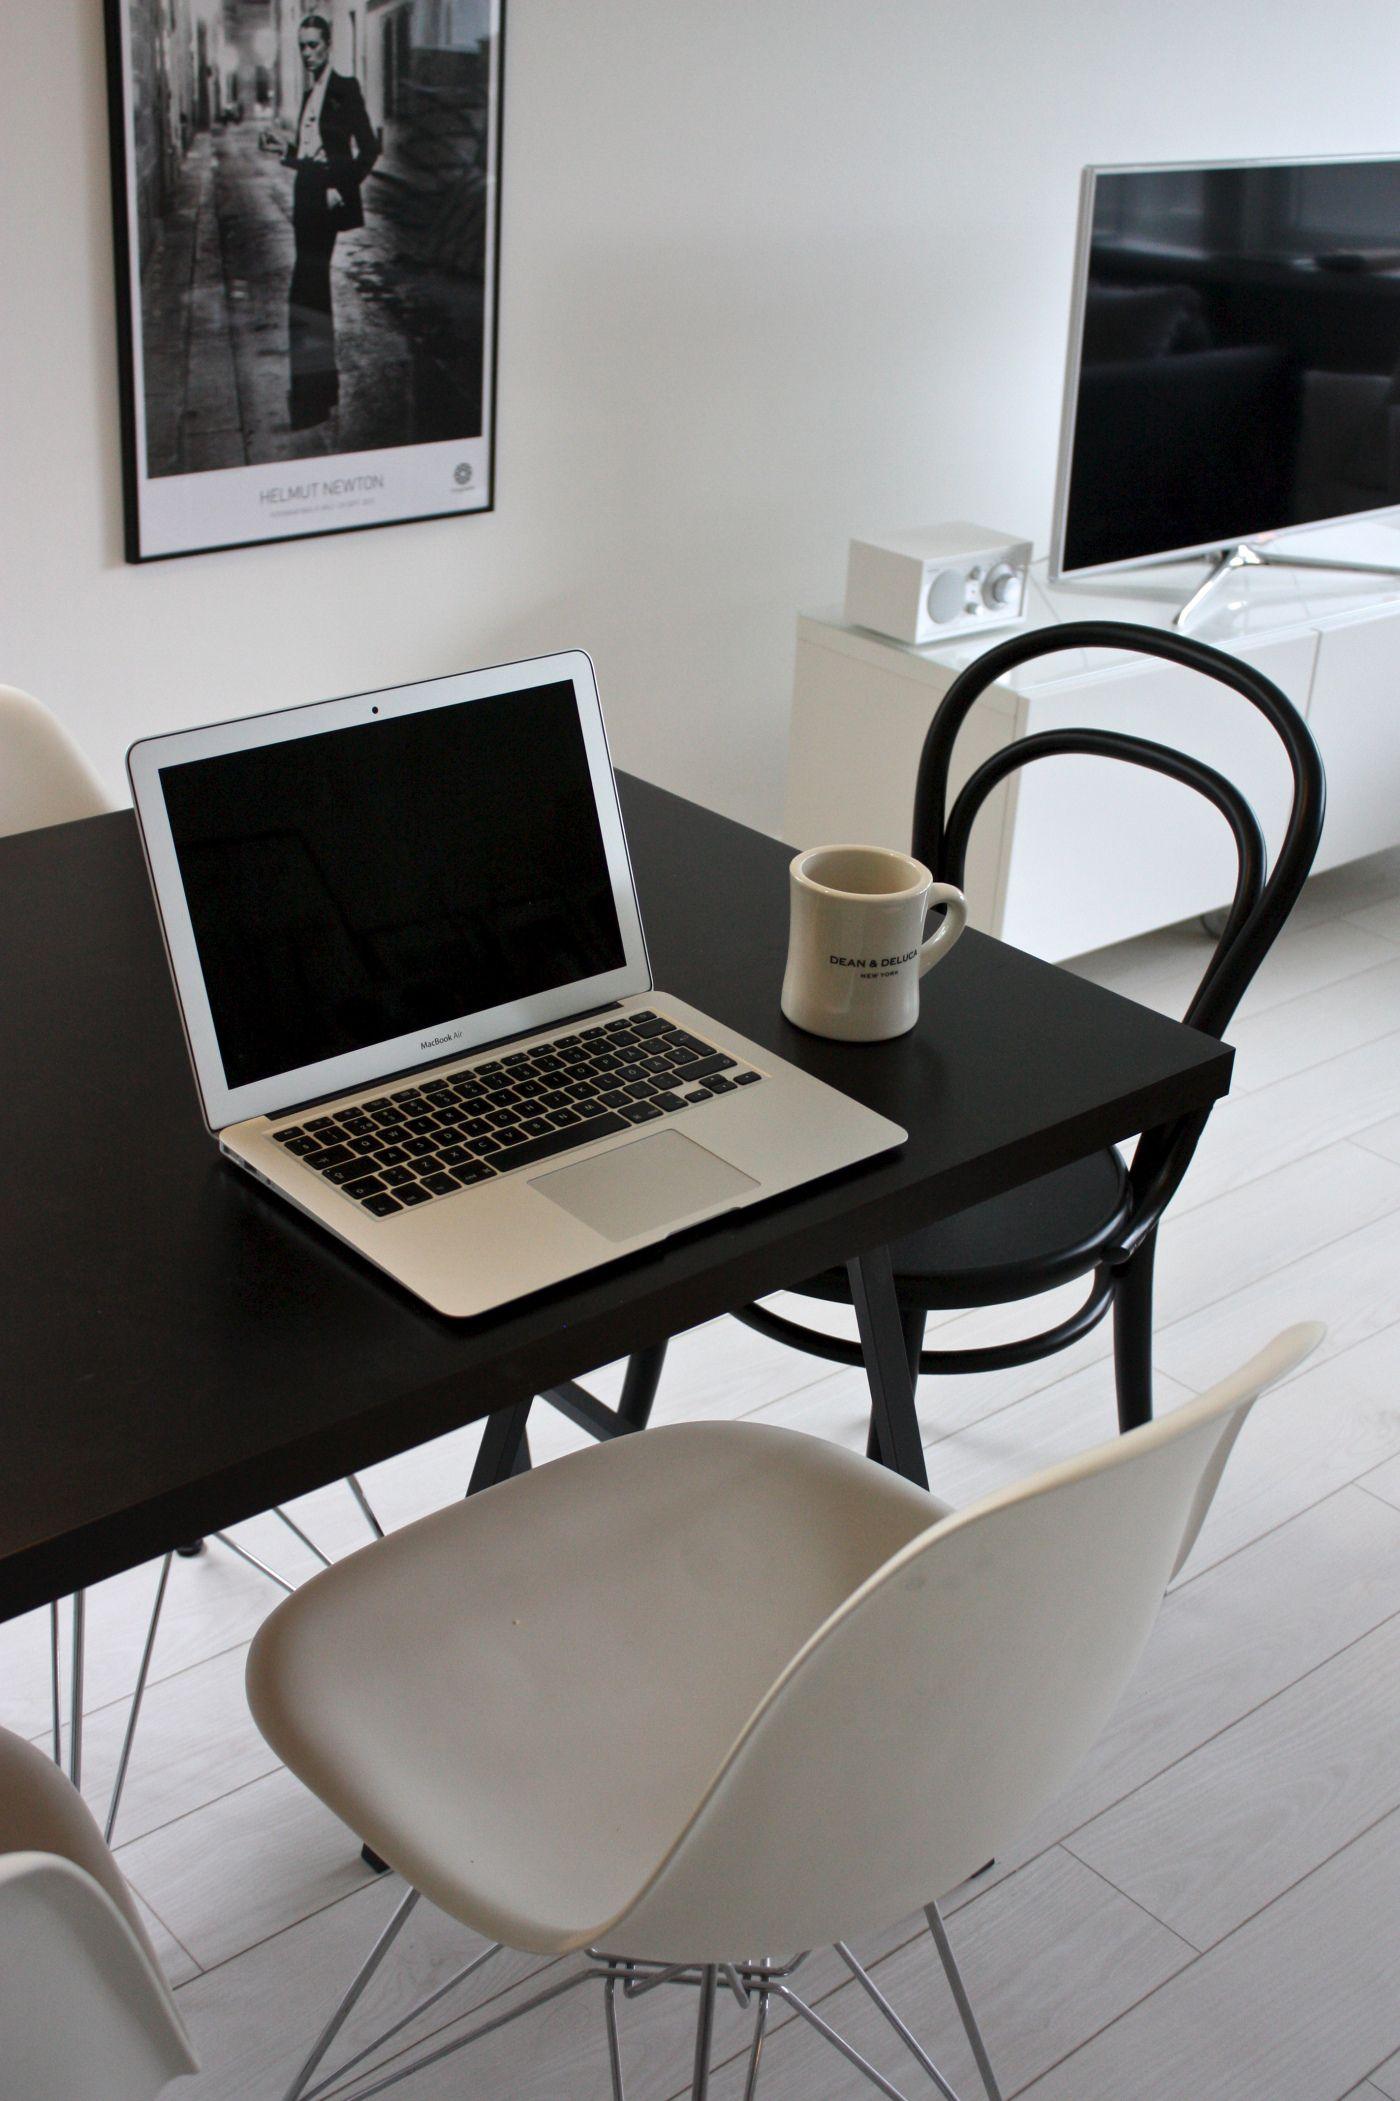 homevialaura | black dining table | Eames DSR | TON Chair 14 | MacBook Air | Tivoli Audio | Samsung TV